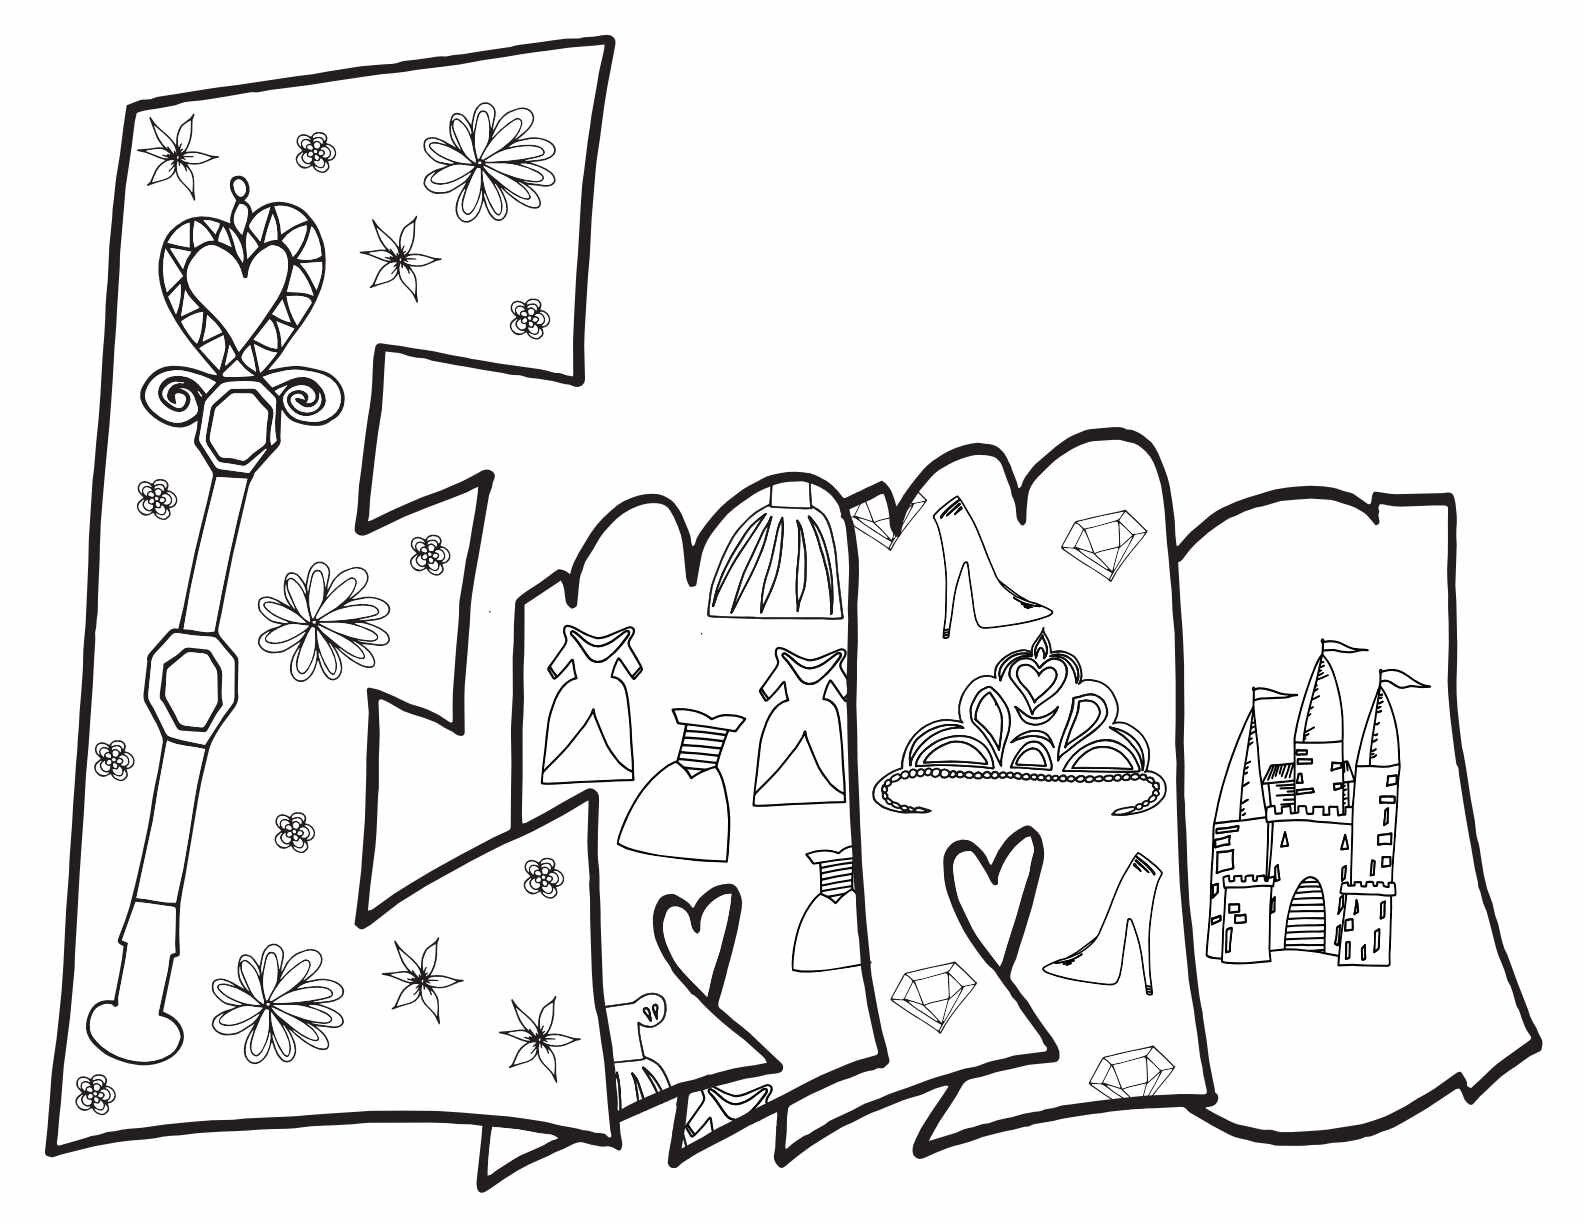 Emma Free Printable Princess Coloring Page Stevie Doodles Princess Coloring Pages Mermaid Coloring Pages Cinderella Coloring Pages